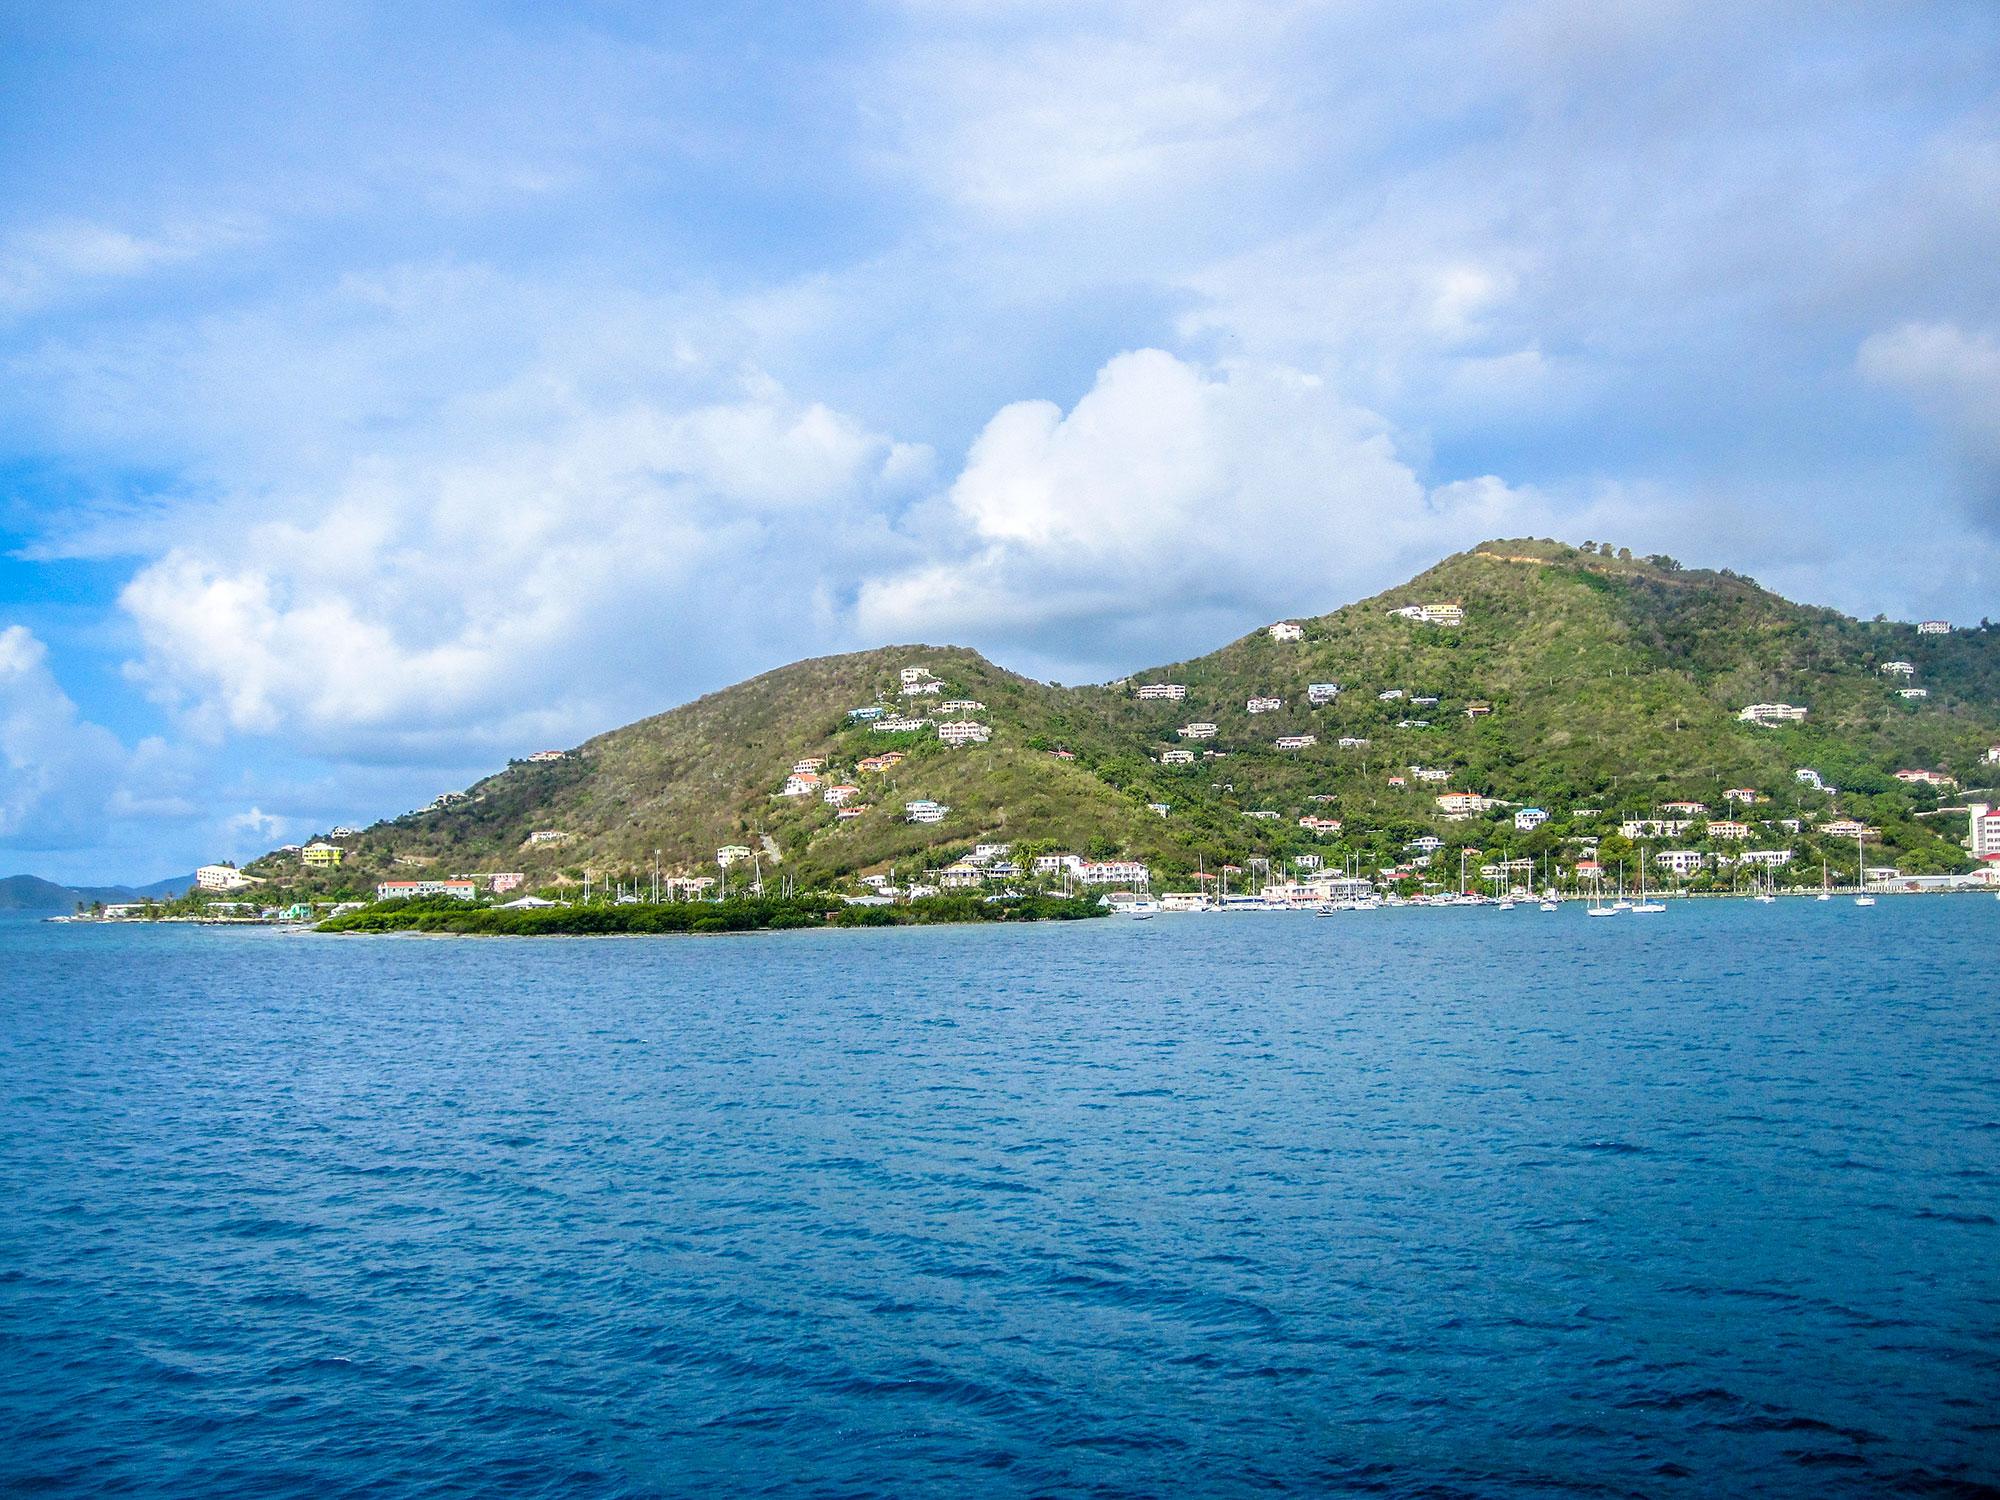 Mountains and coastline of Tortola, BVI